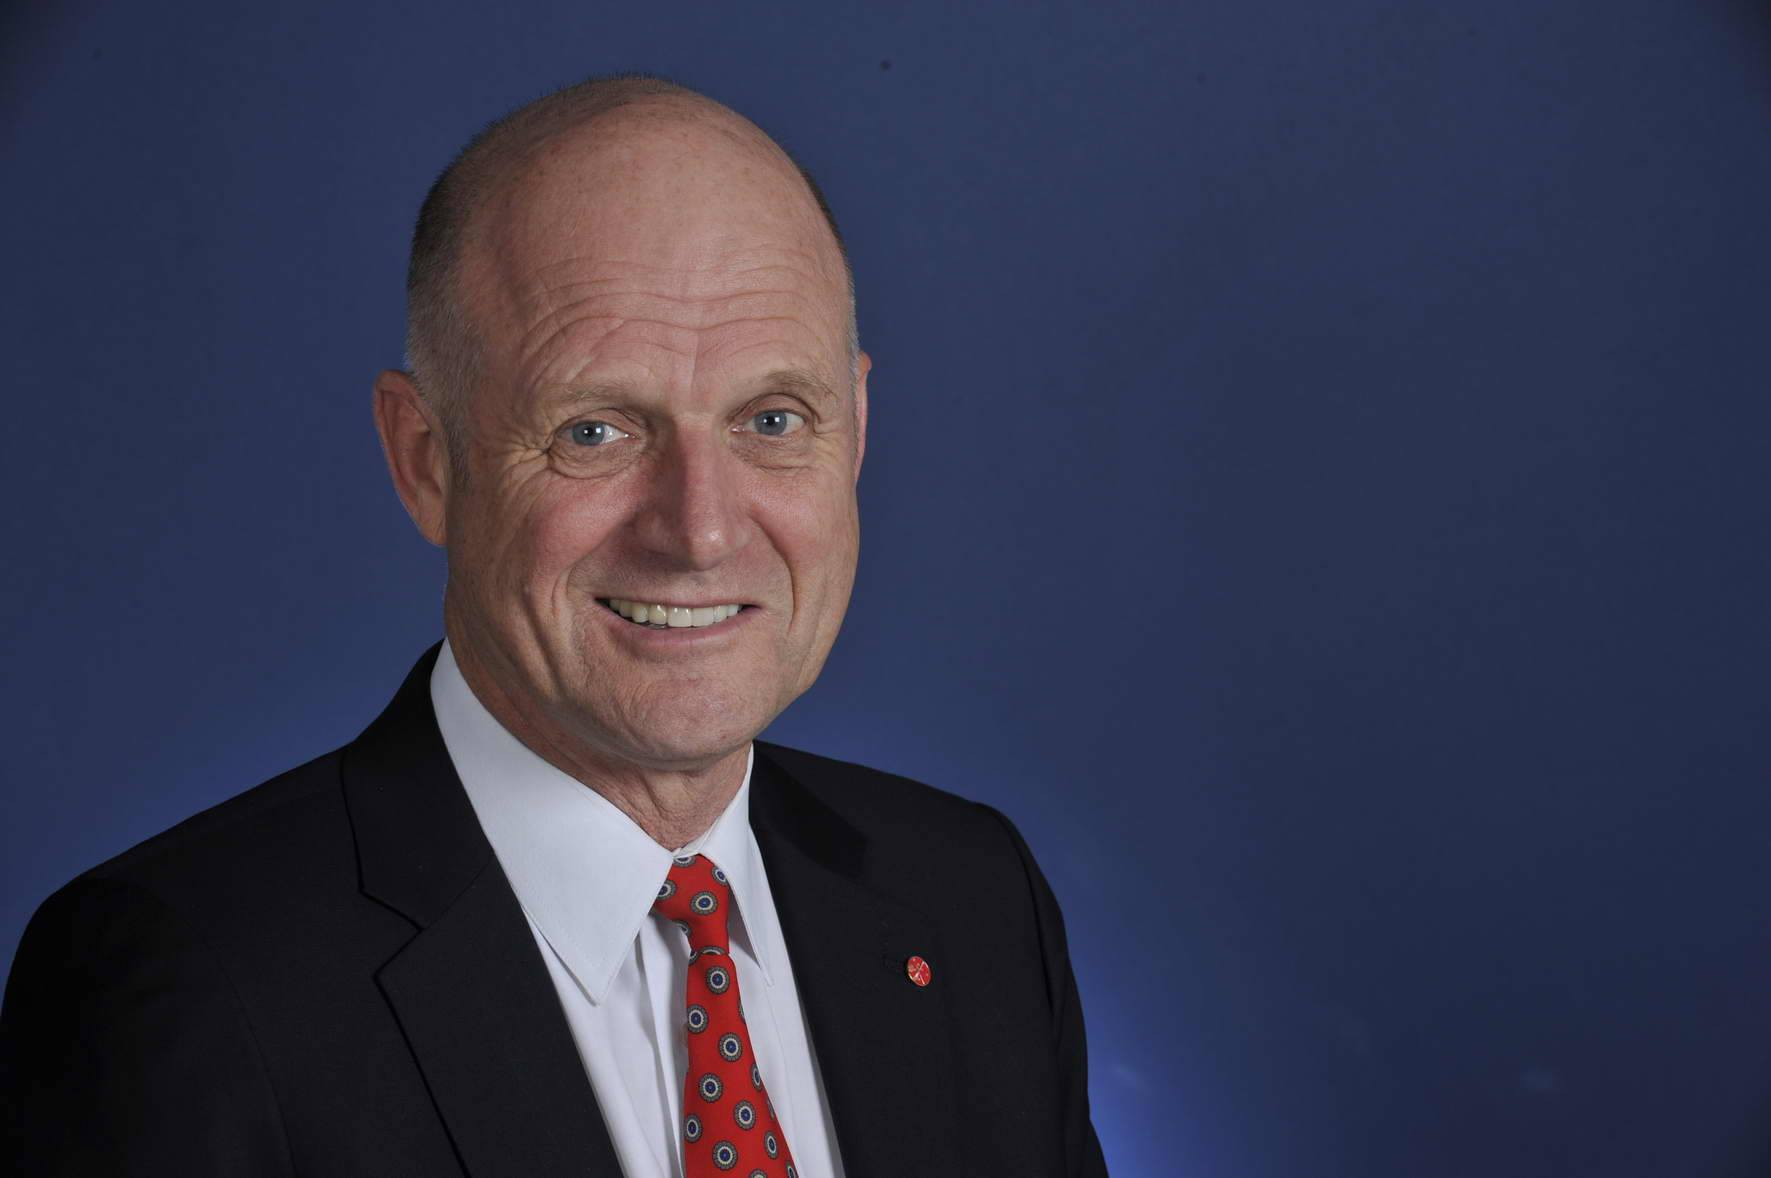 Liberal Democrats Senator David Leyonhjelm